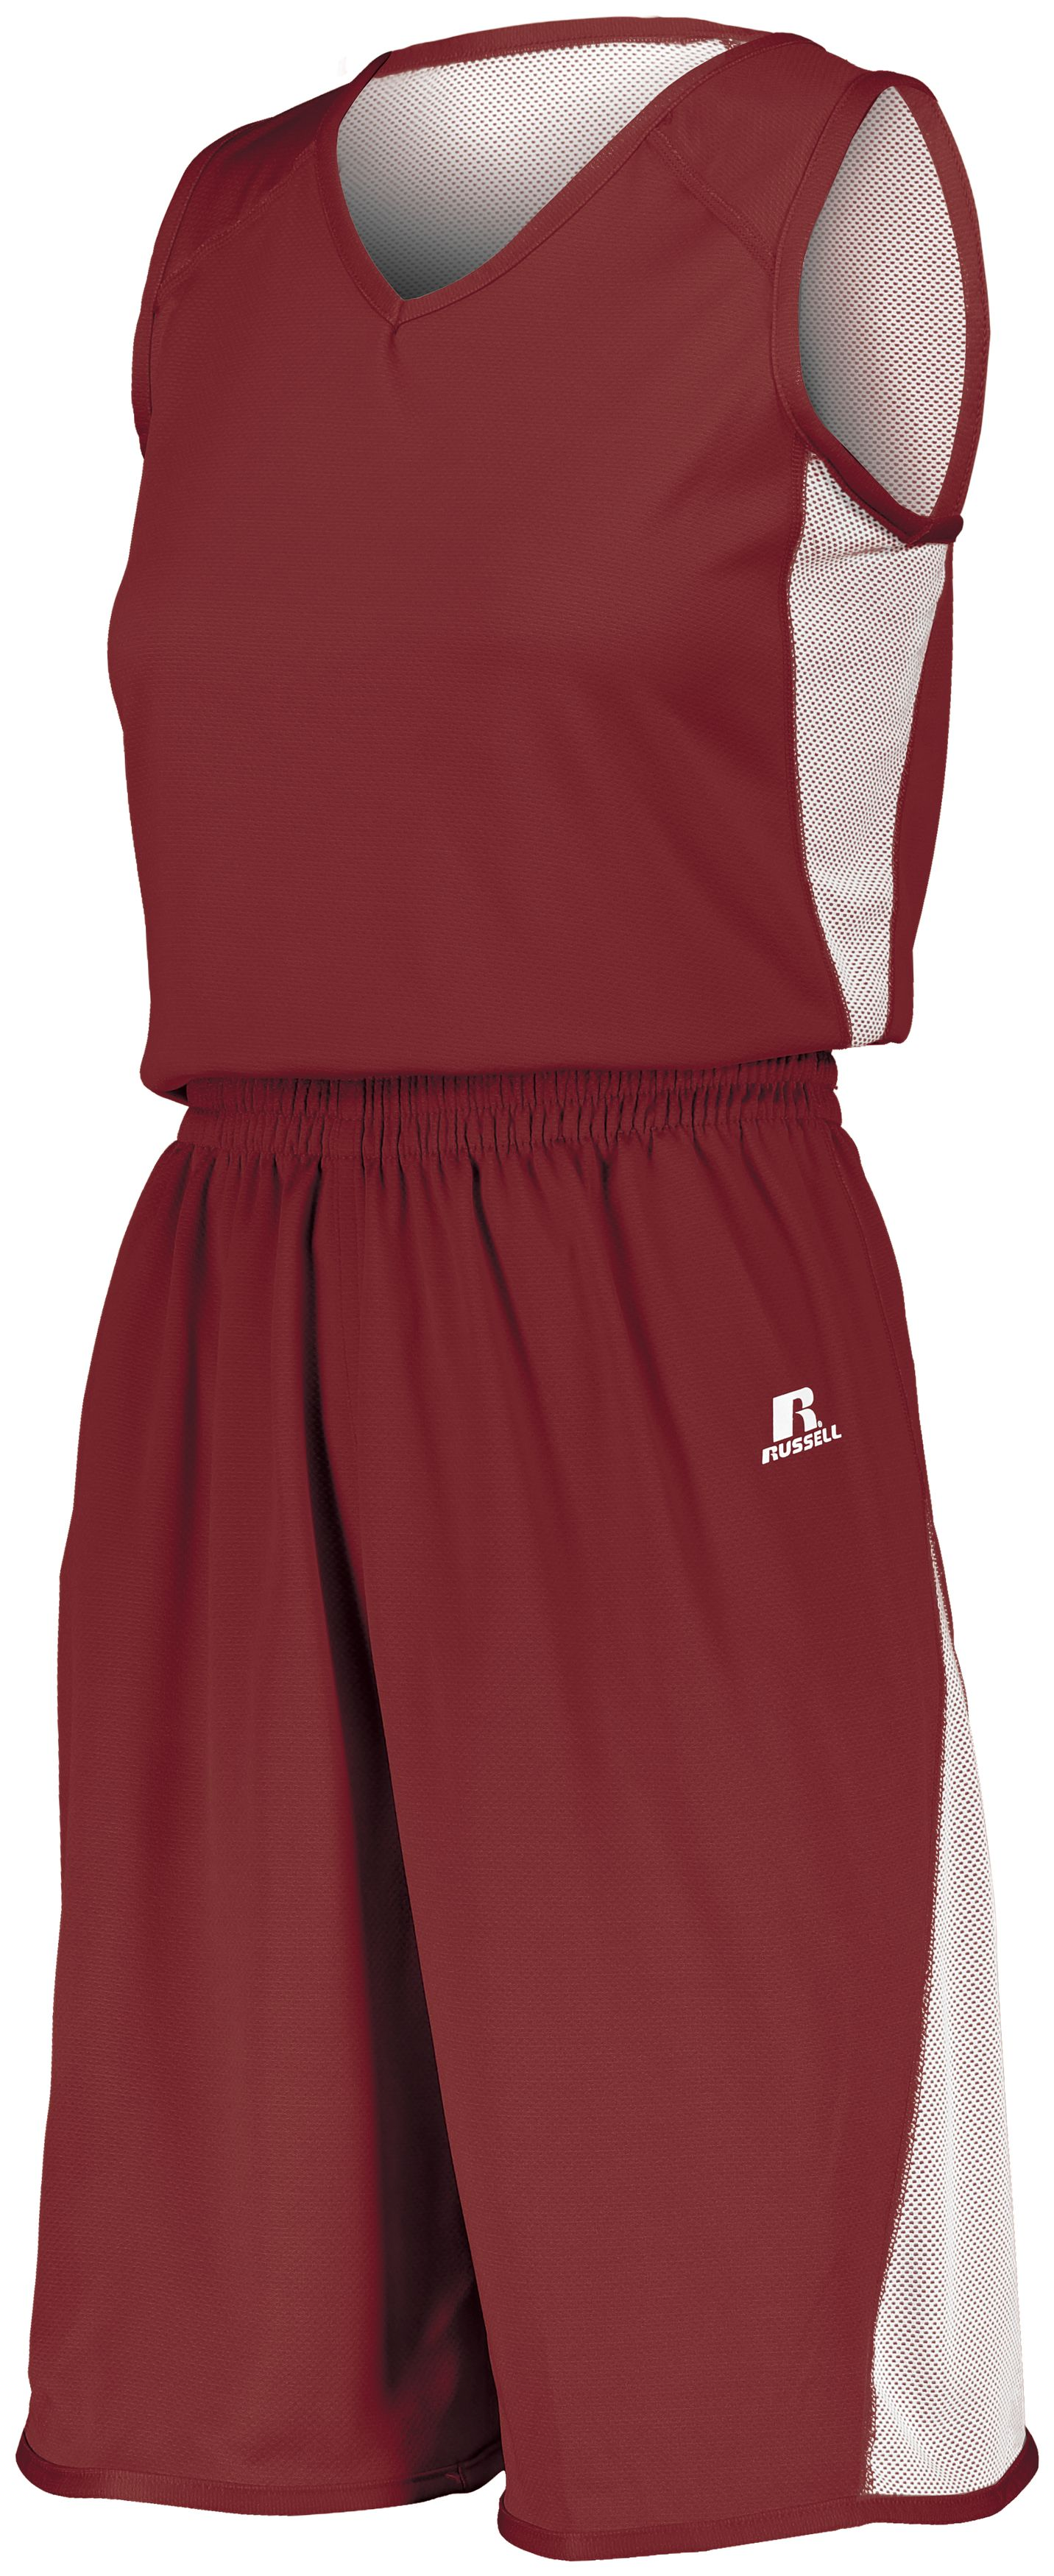 Ladies Undivided Single Ply Reversible Shorts - CARDINAL/WHITE